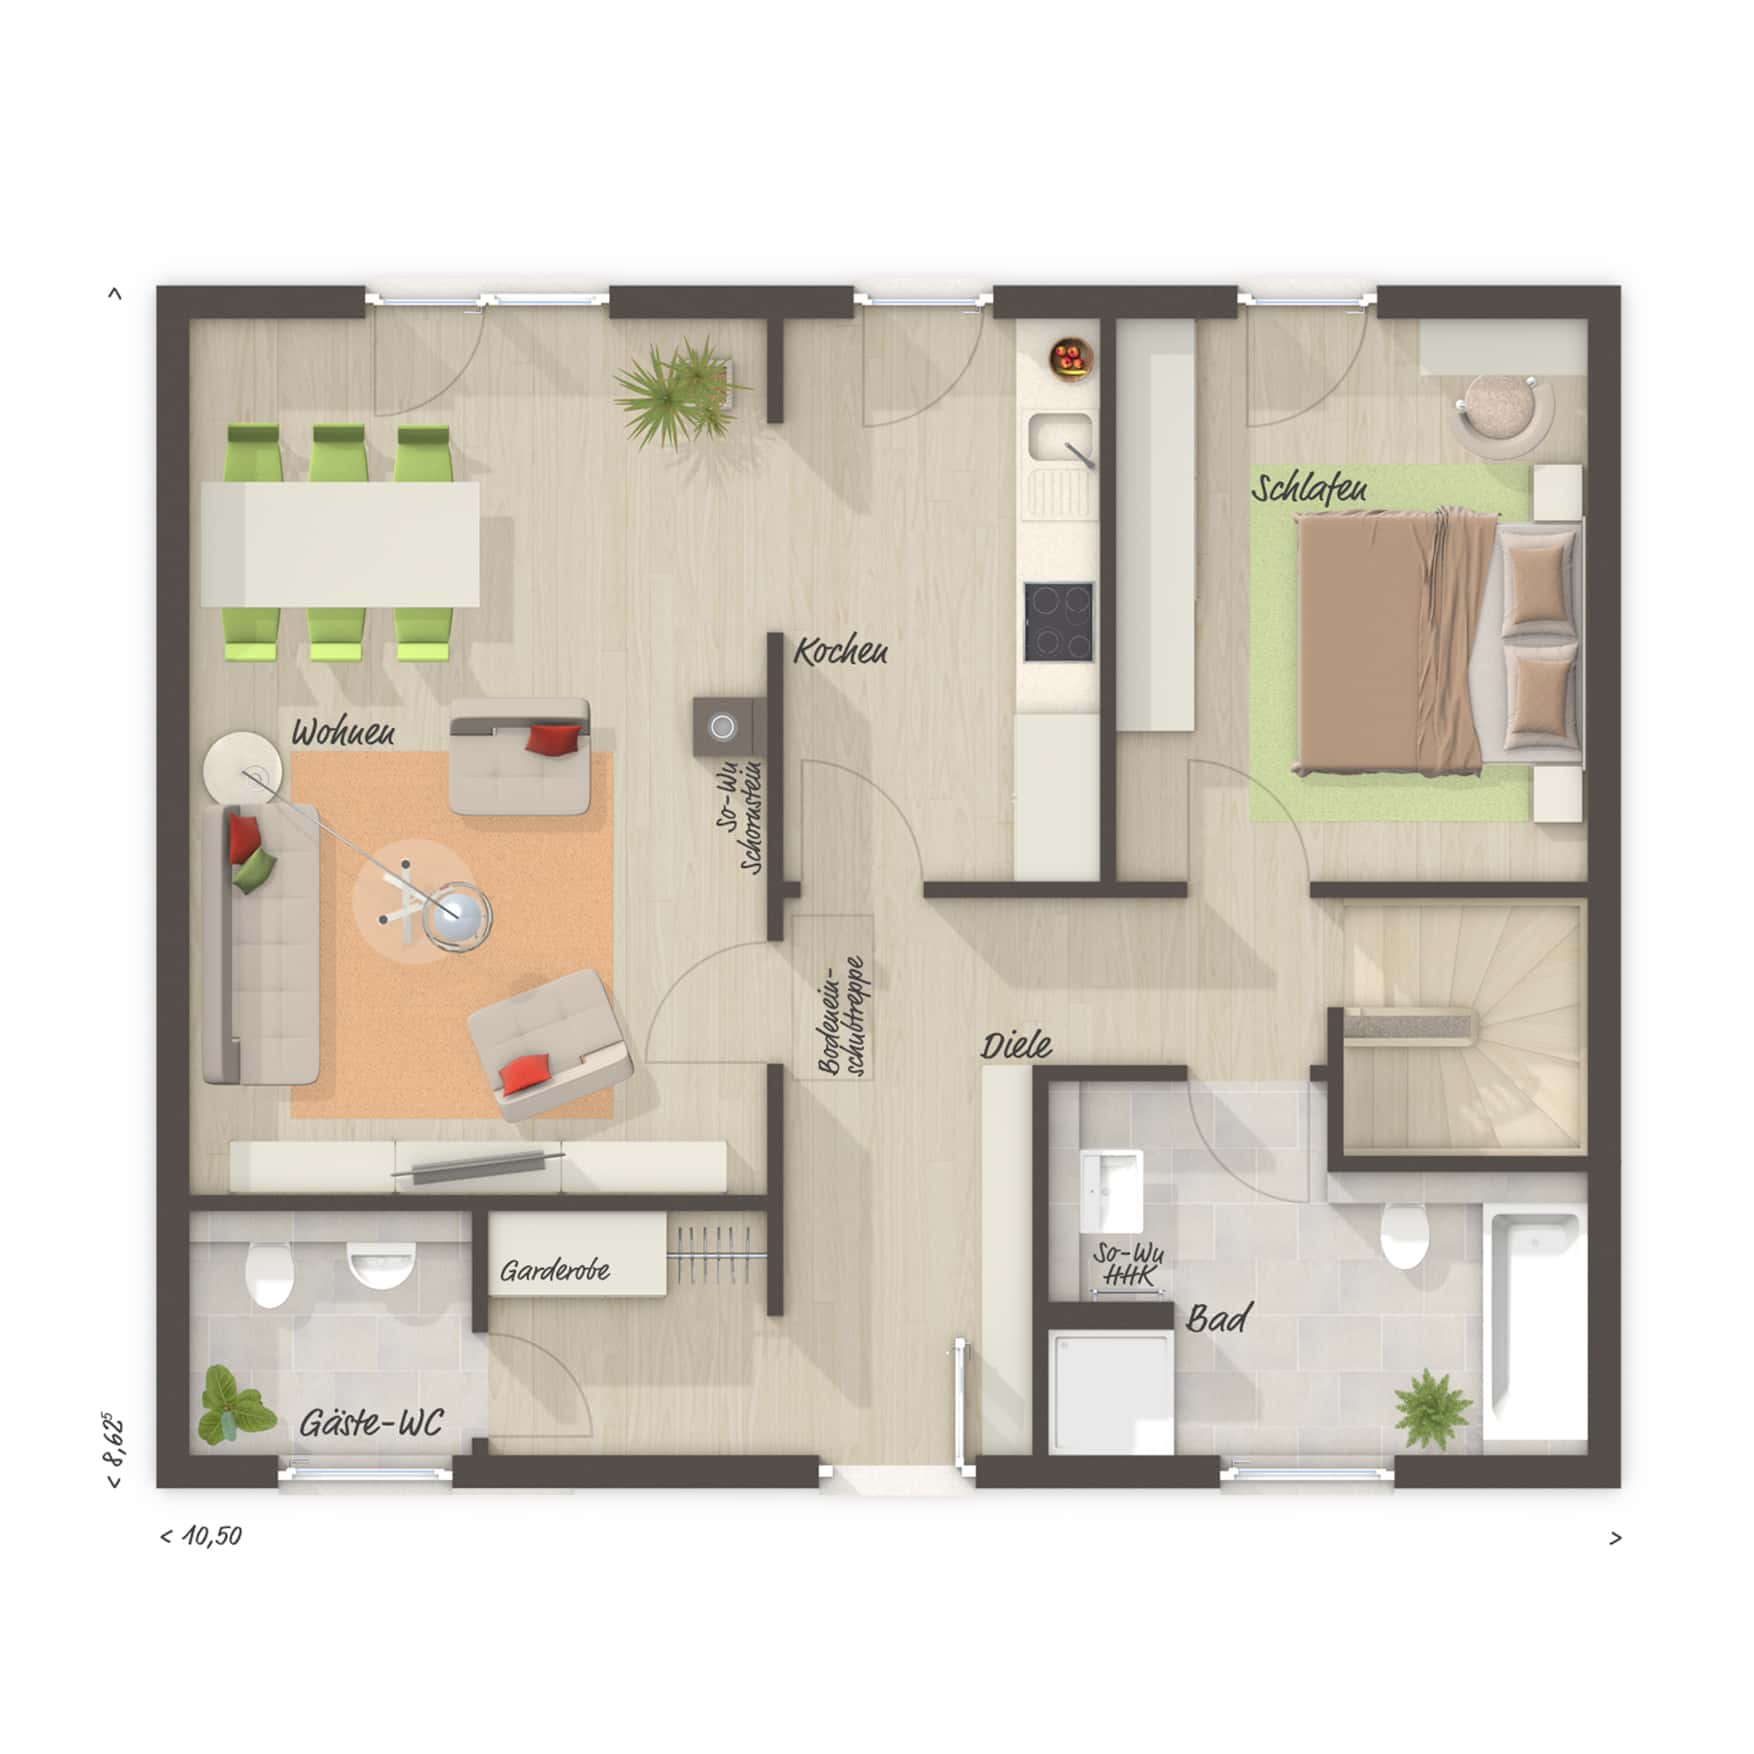 Grundriss Bungalow mit Keller, 2 Zimmer, 77 qm - Massivhaus schlüsselfertig bauen Ideen Town Country Haus BUNGALOW 78 trend - HausbauDirekt.de